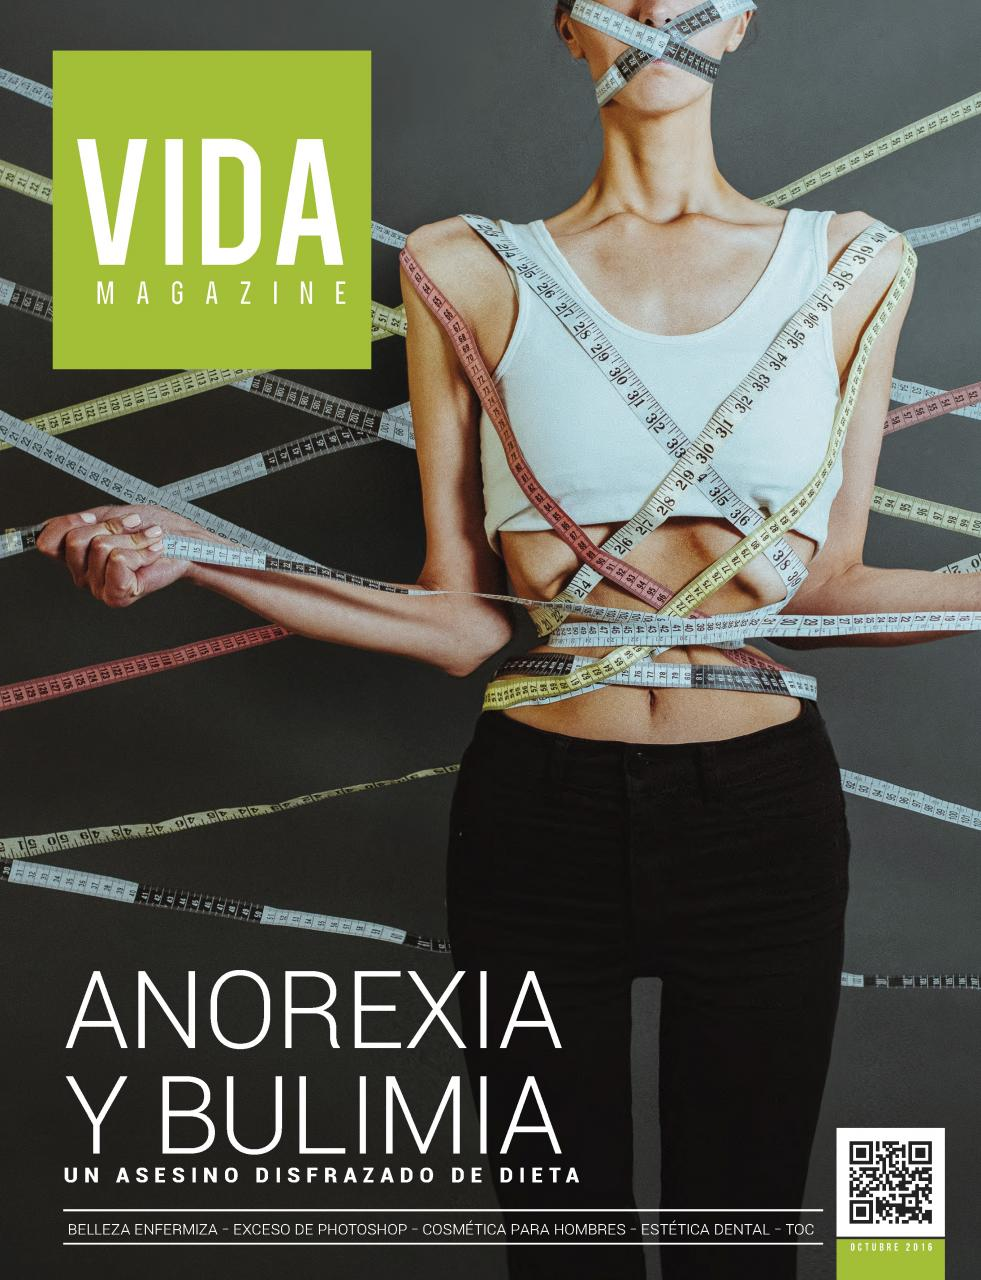 vida-magazine-edicion-n25